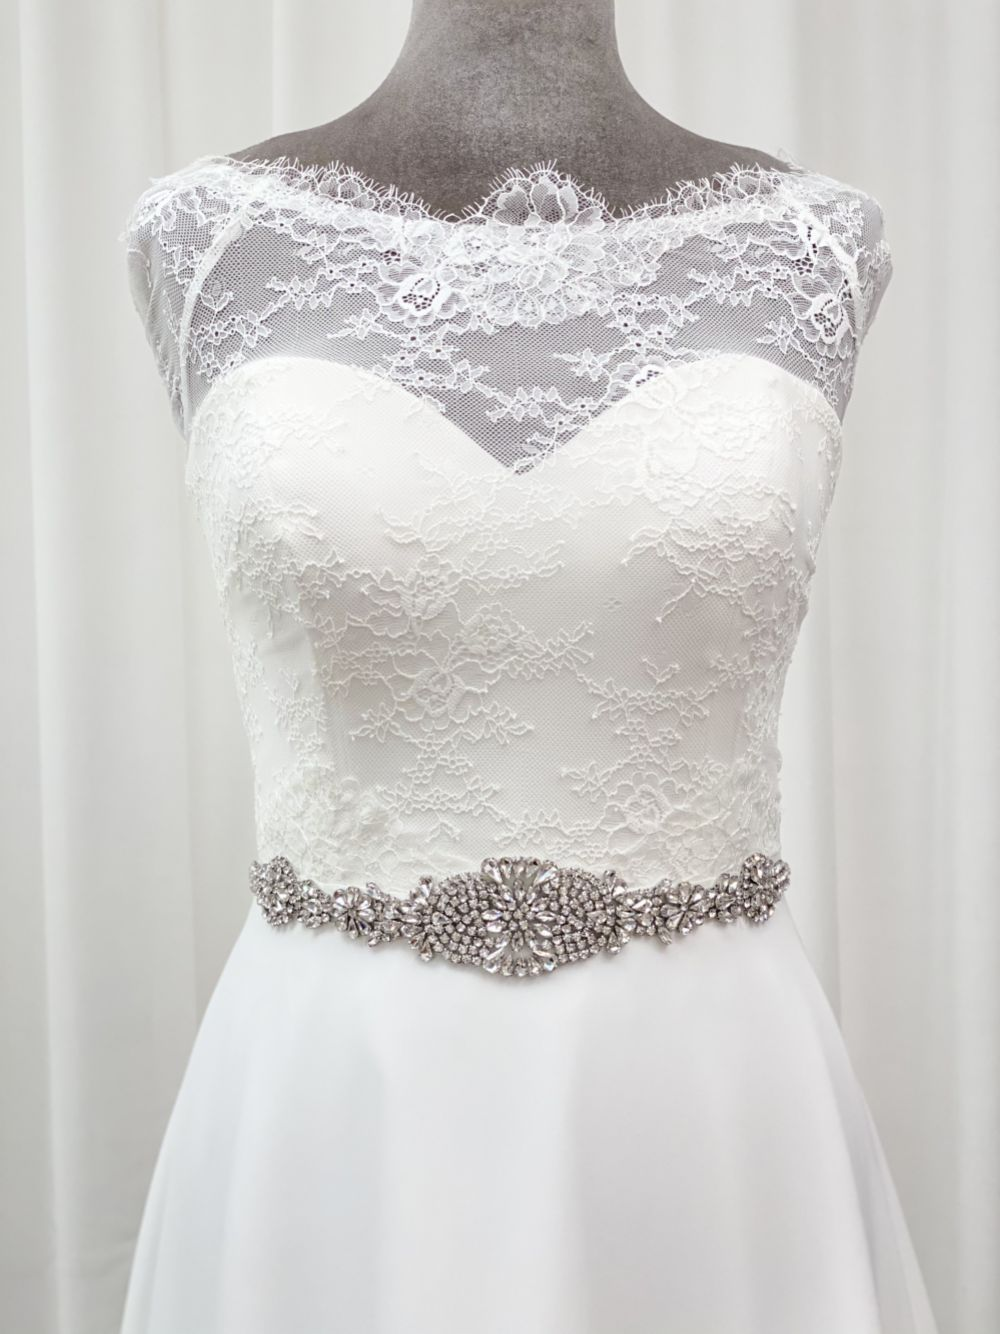 Perfect Bridal Lana Dazzling Crystal Embellished Dress Belt